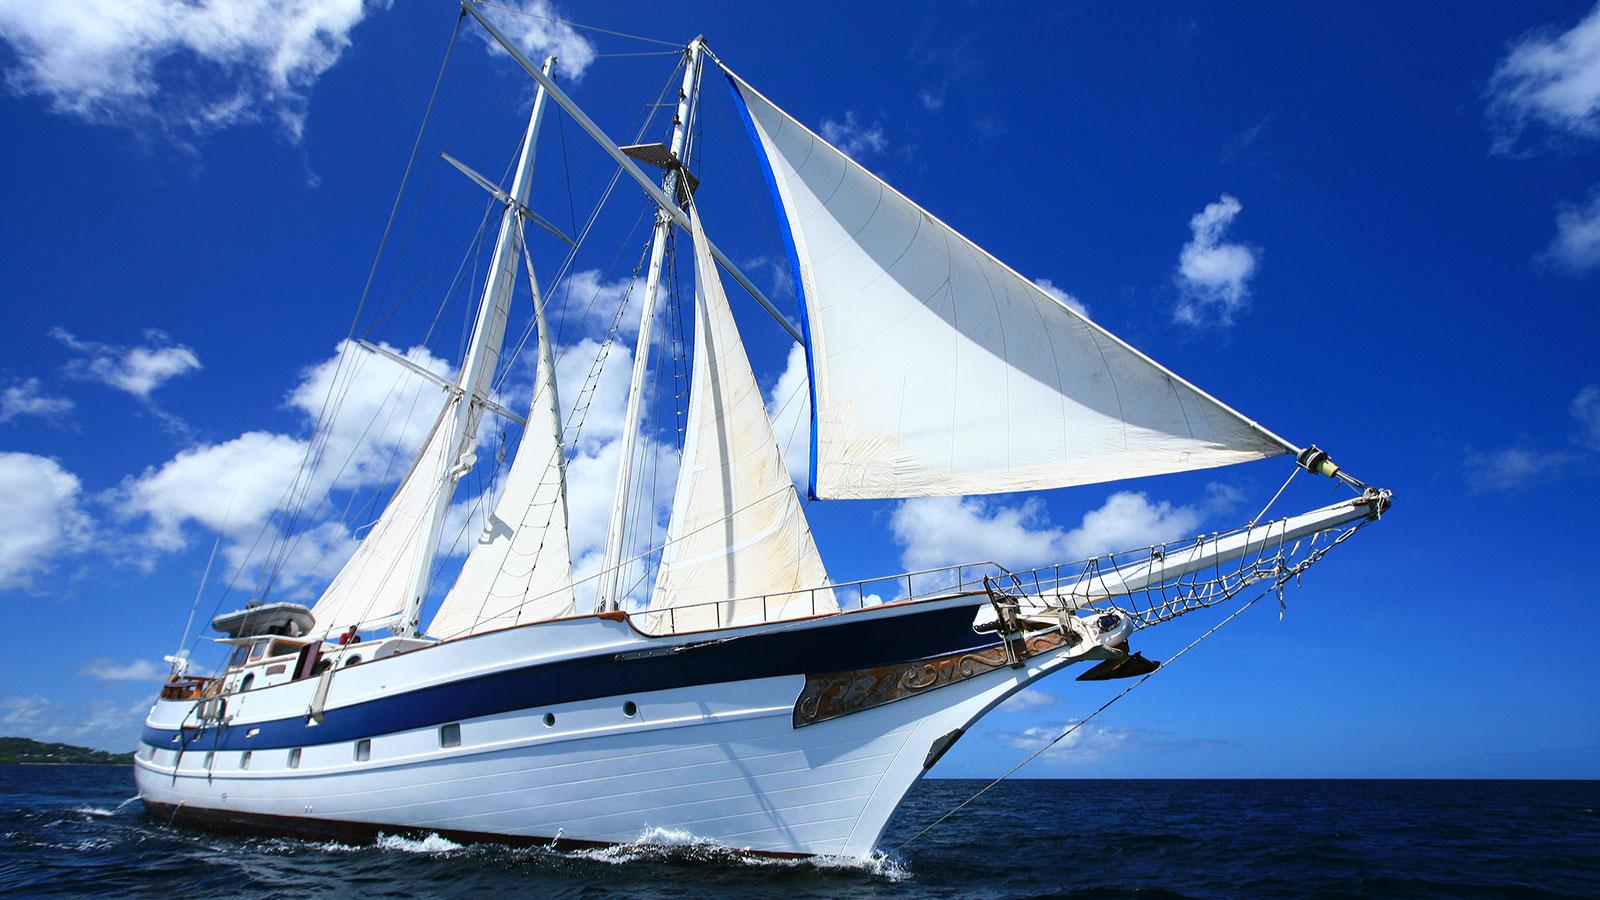 8 small cruise ships big on luxury, intimacy, adventure   CNN Travel